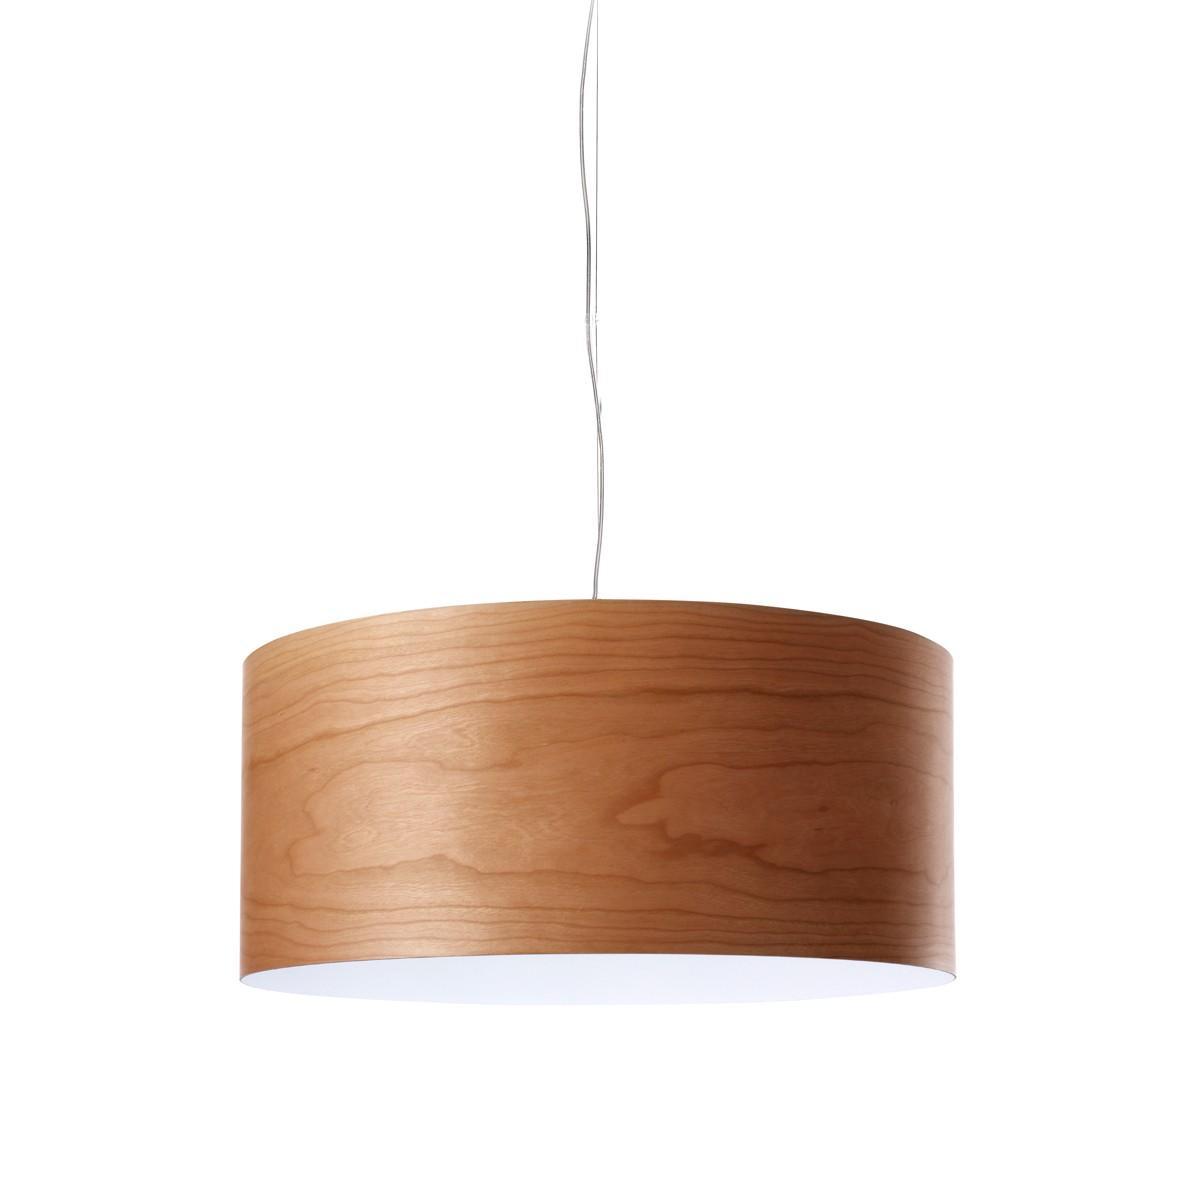 LZF Lamps Gea Small Pendelleuchte, Kirsche